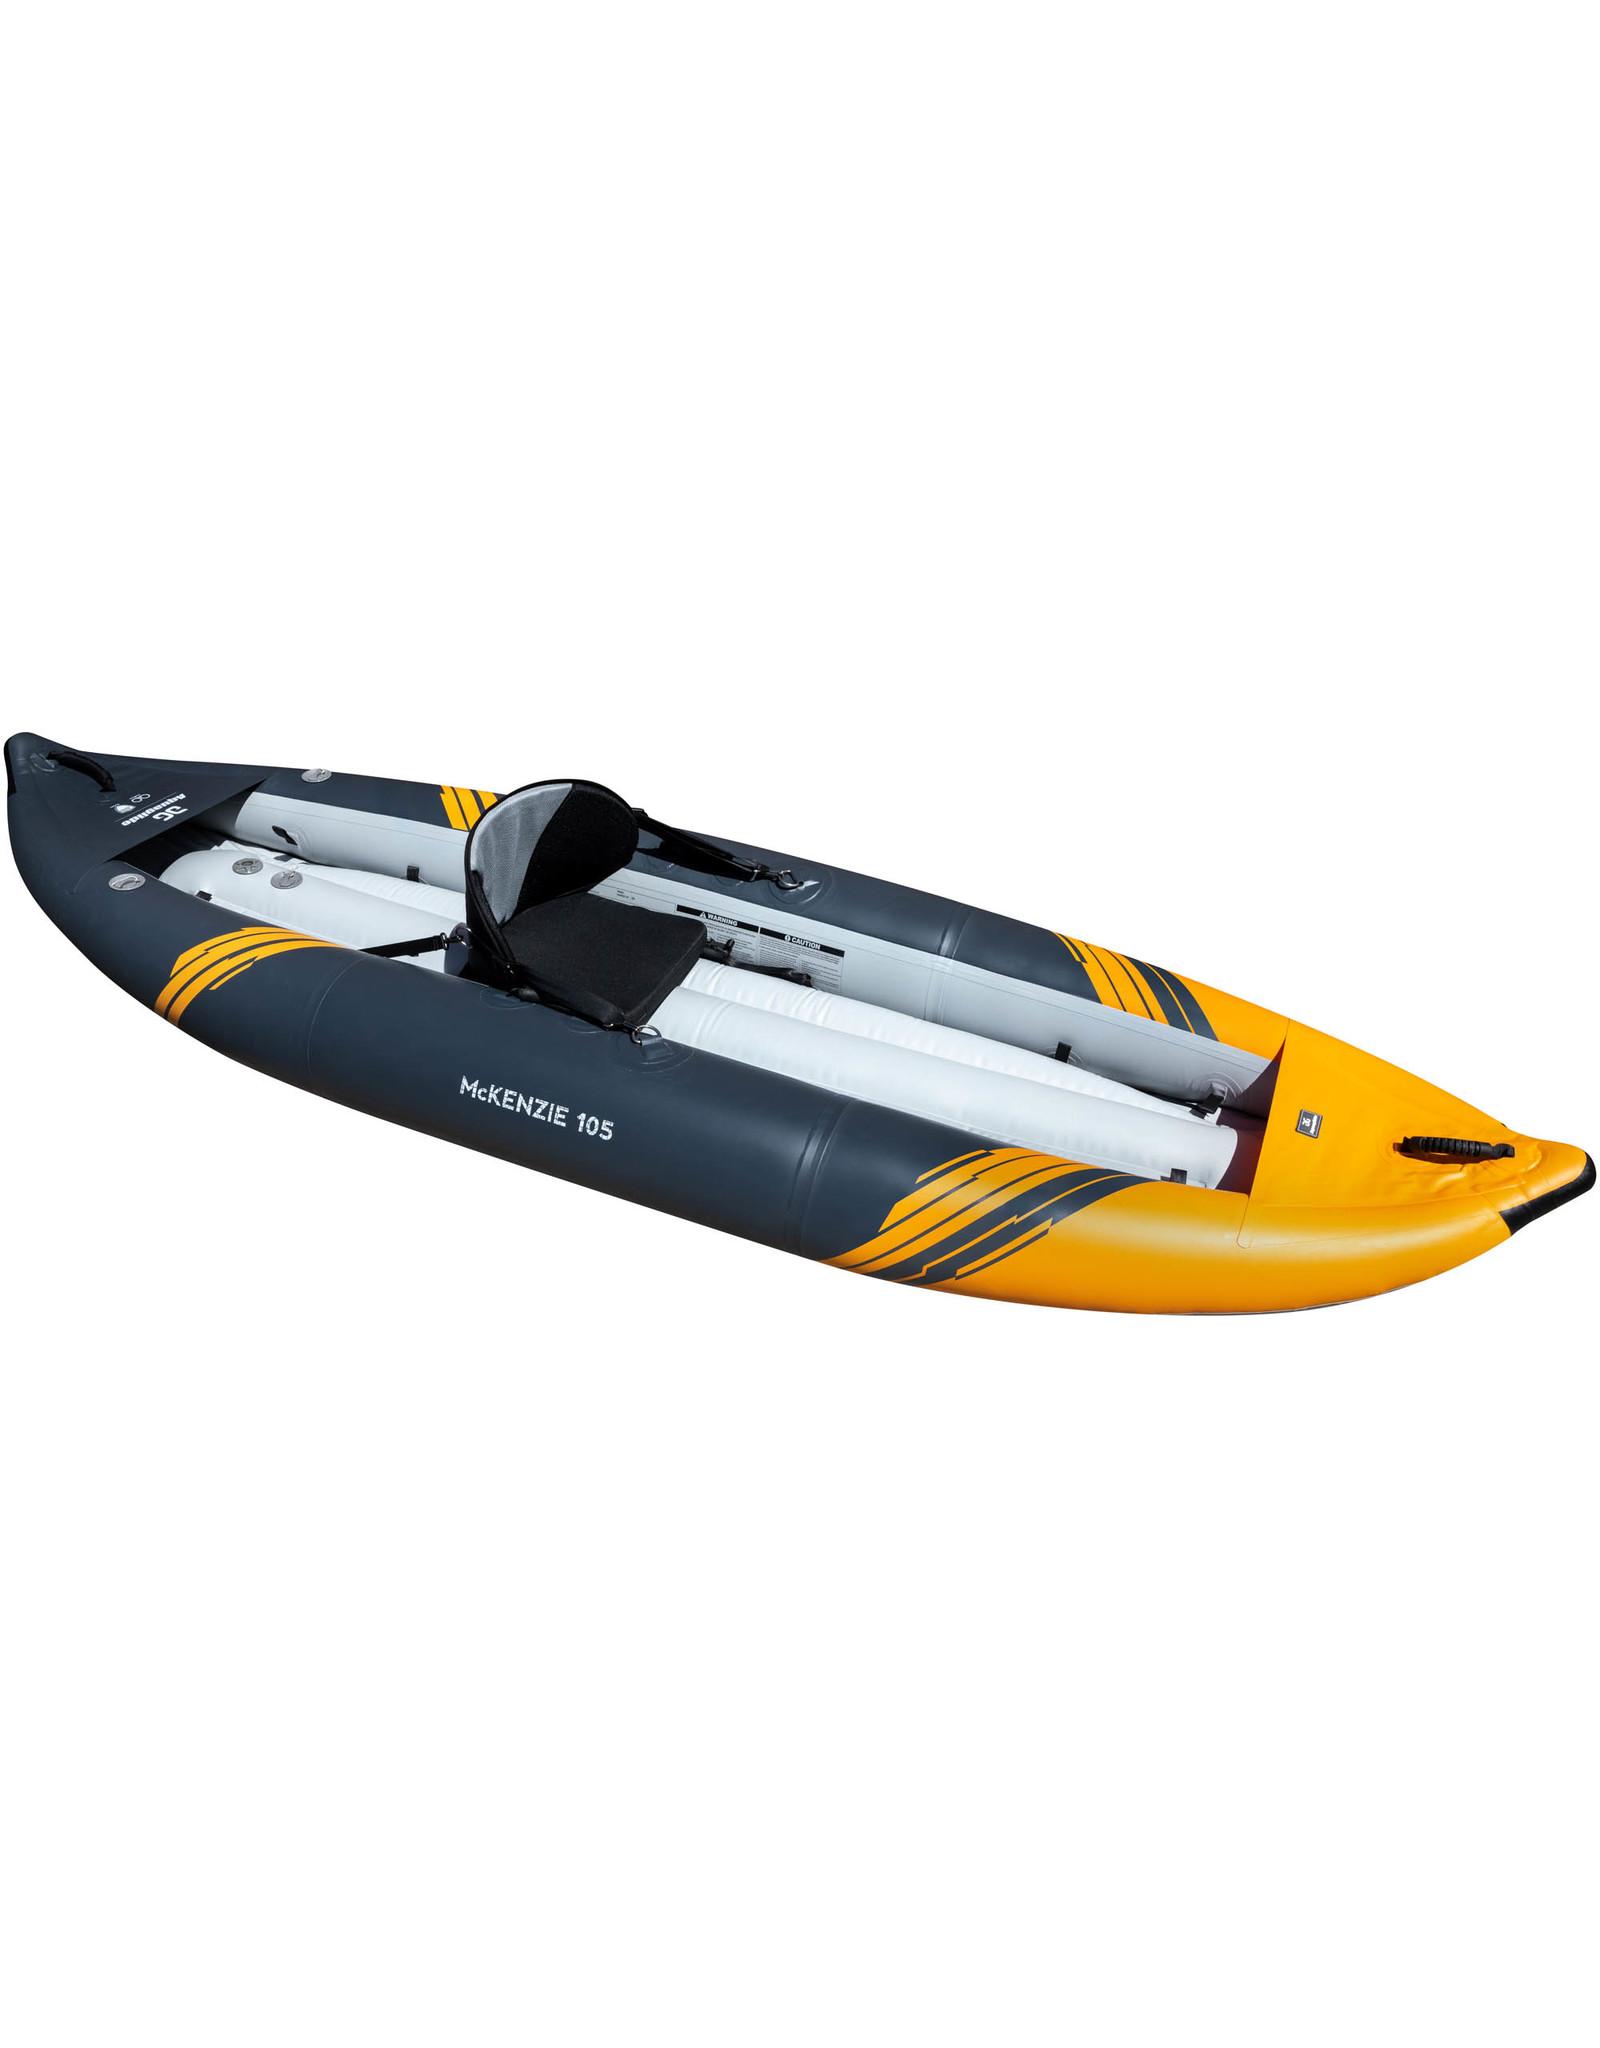 Aquaglide Aquaglide Mckenzie 105 Inflatable Solo Kayak